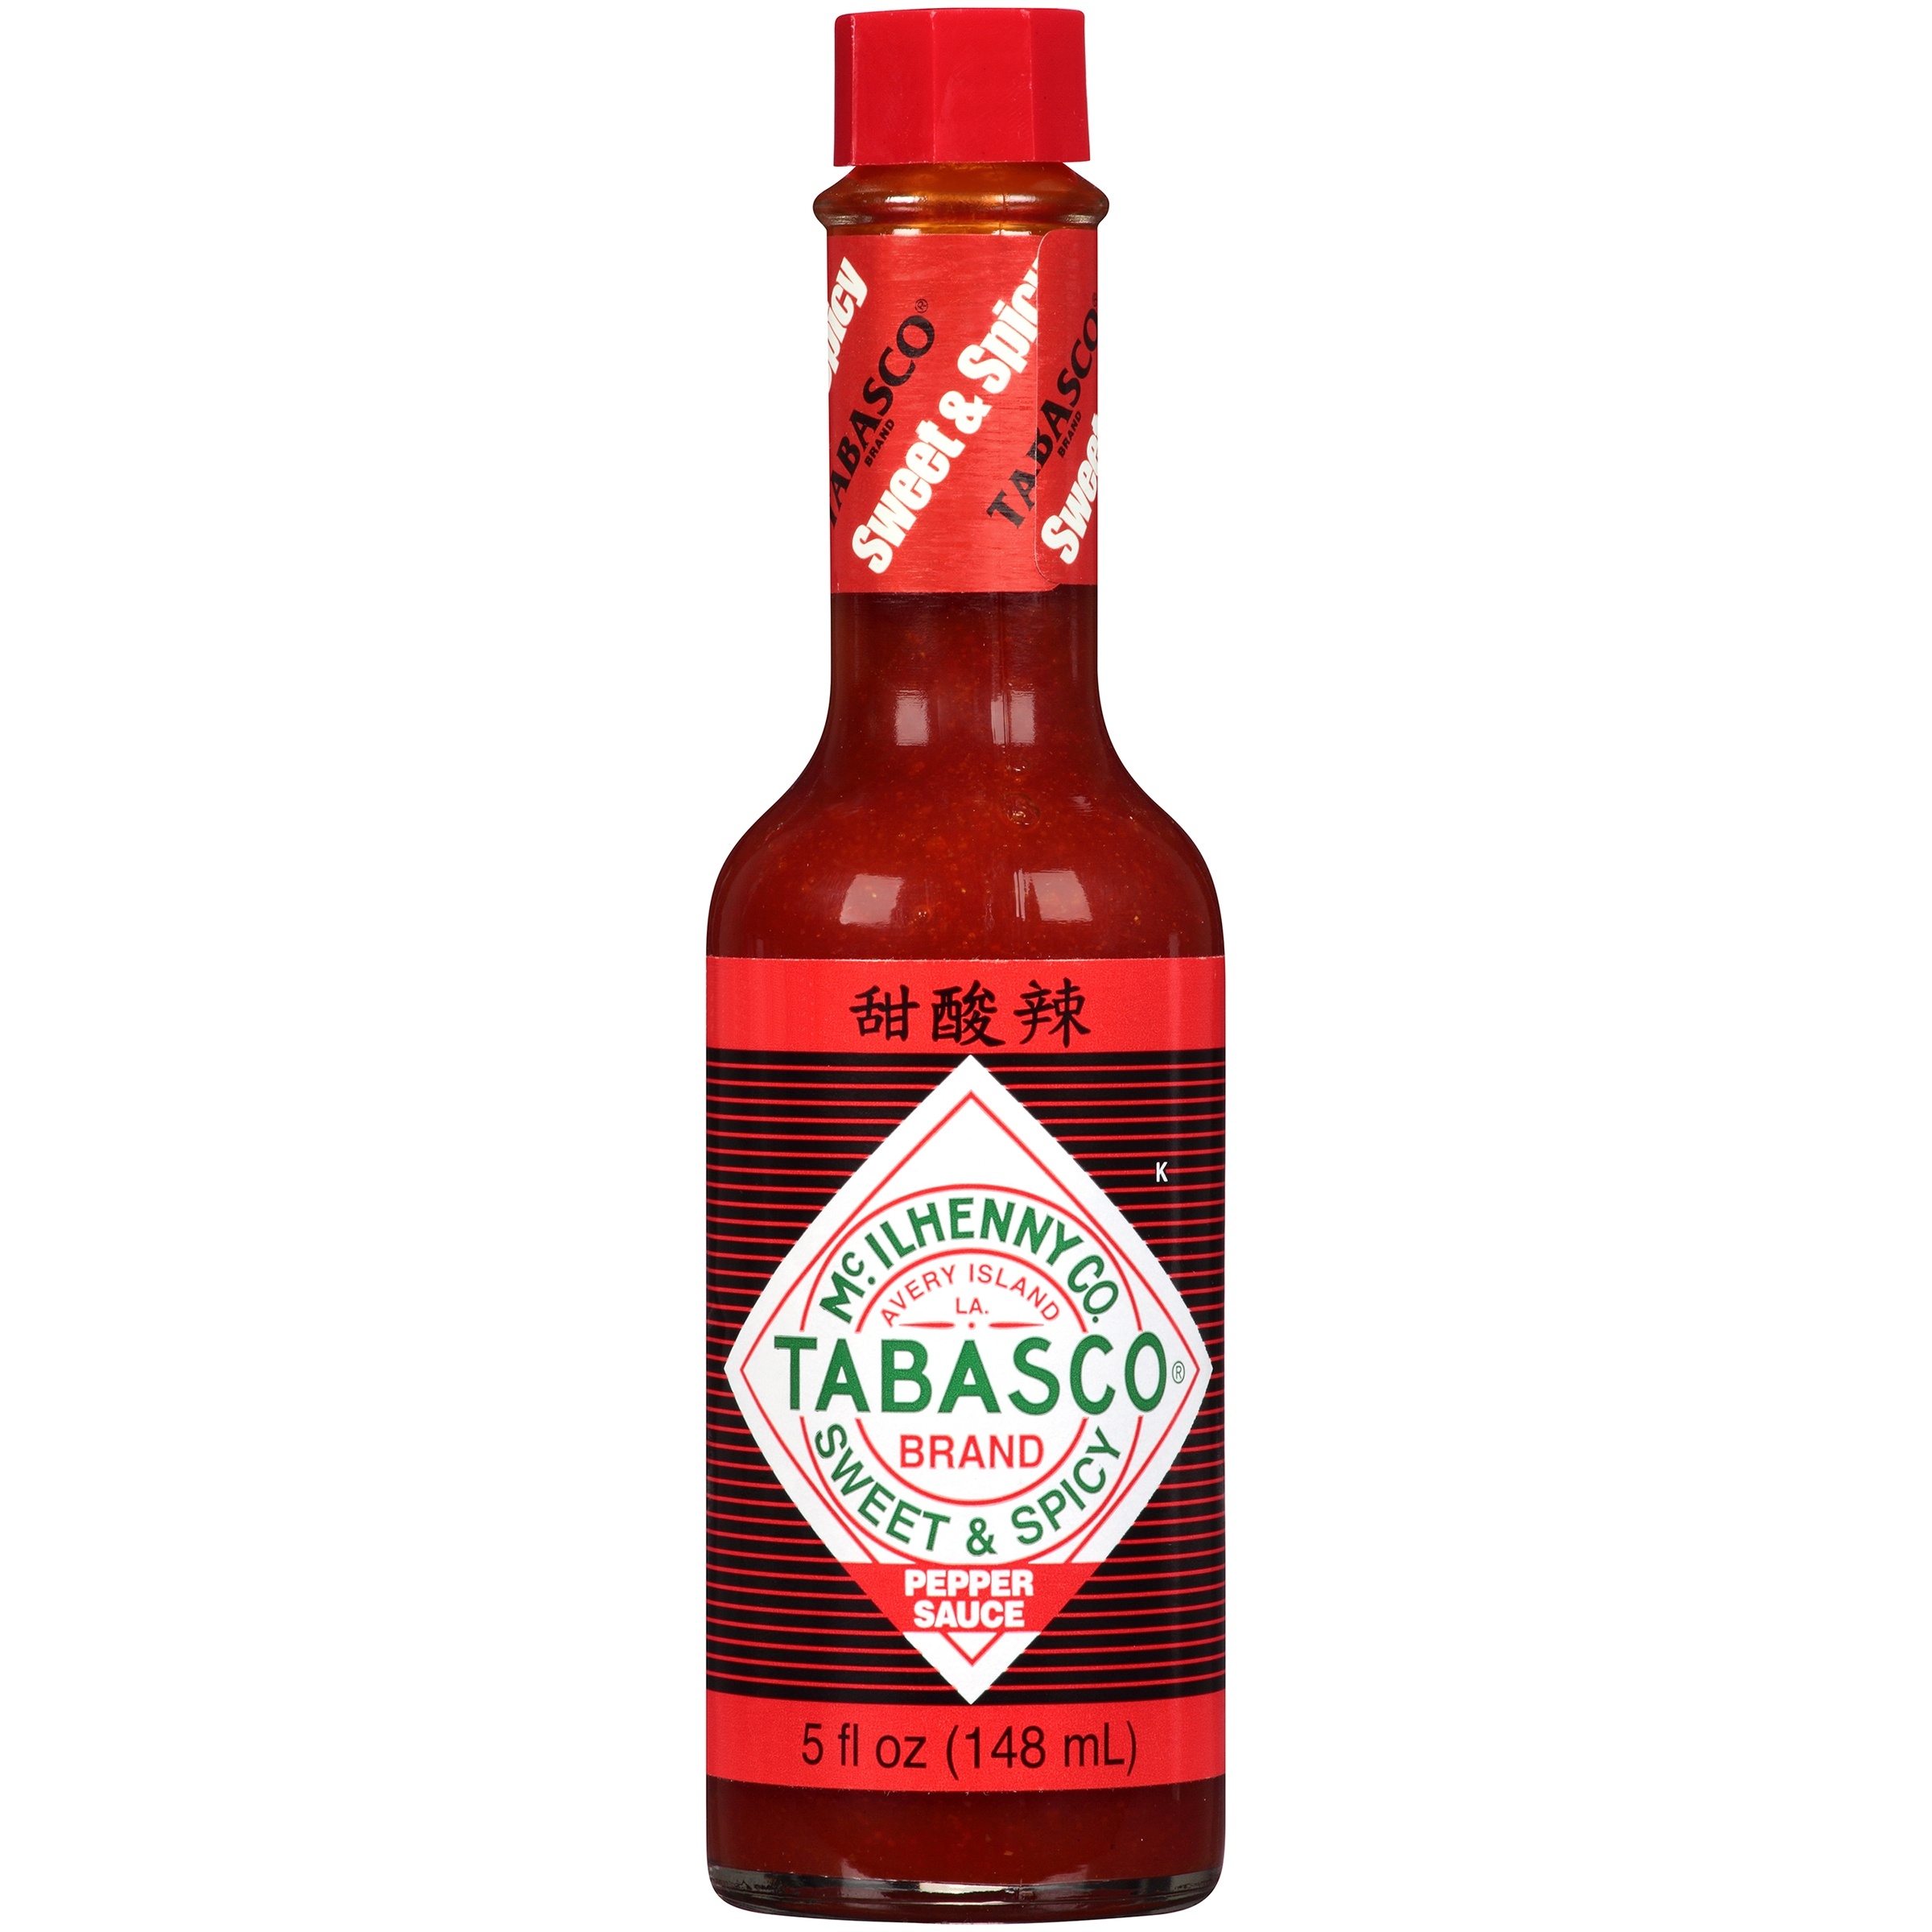 TABASCO® Brand Sweet & Spicy Pepper Sauce 5 fl. oz. Bottle - Walmart.com